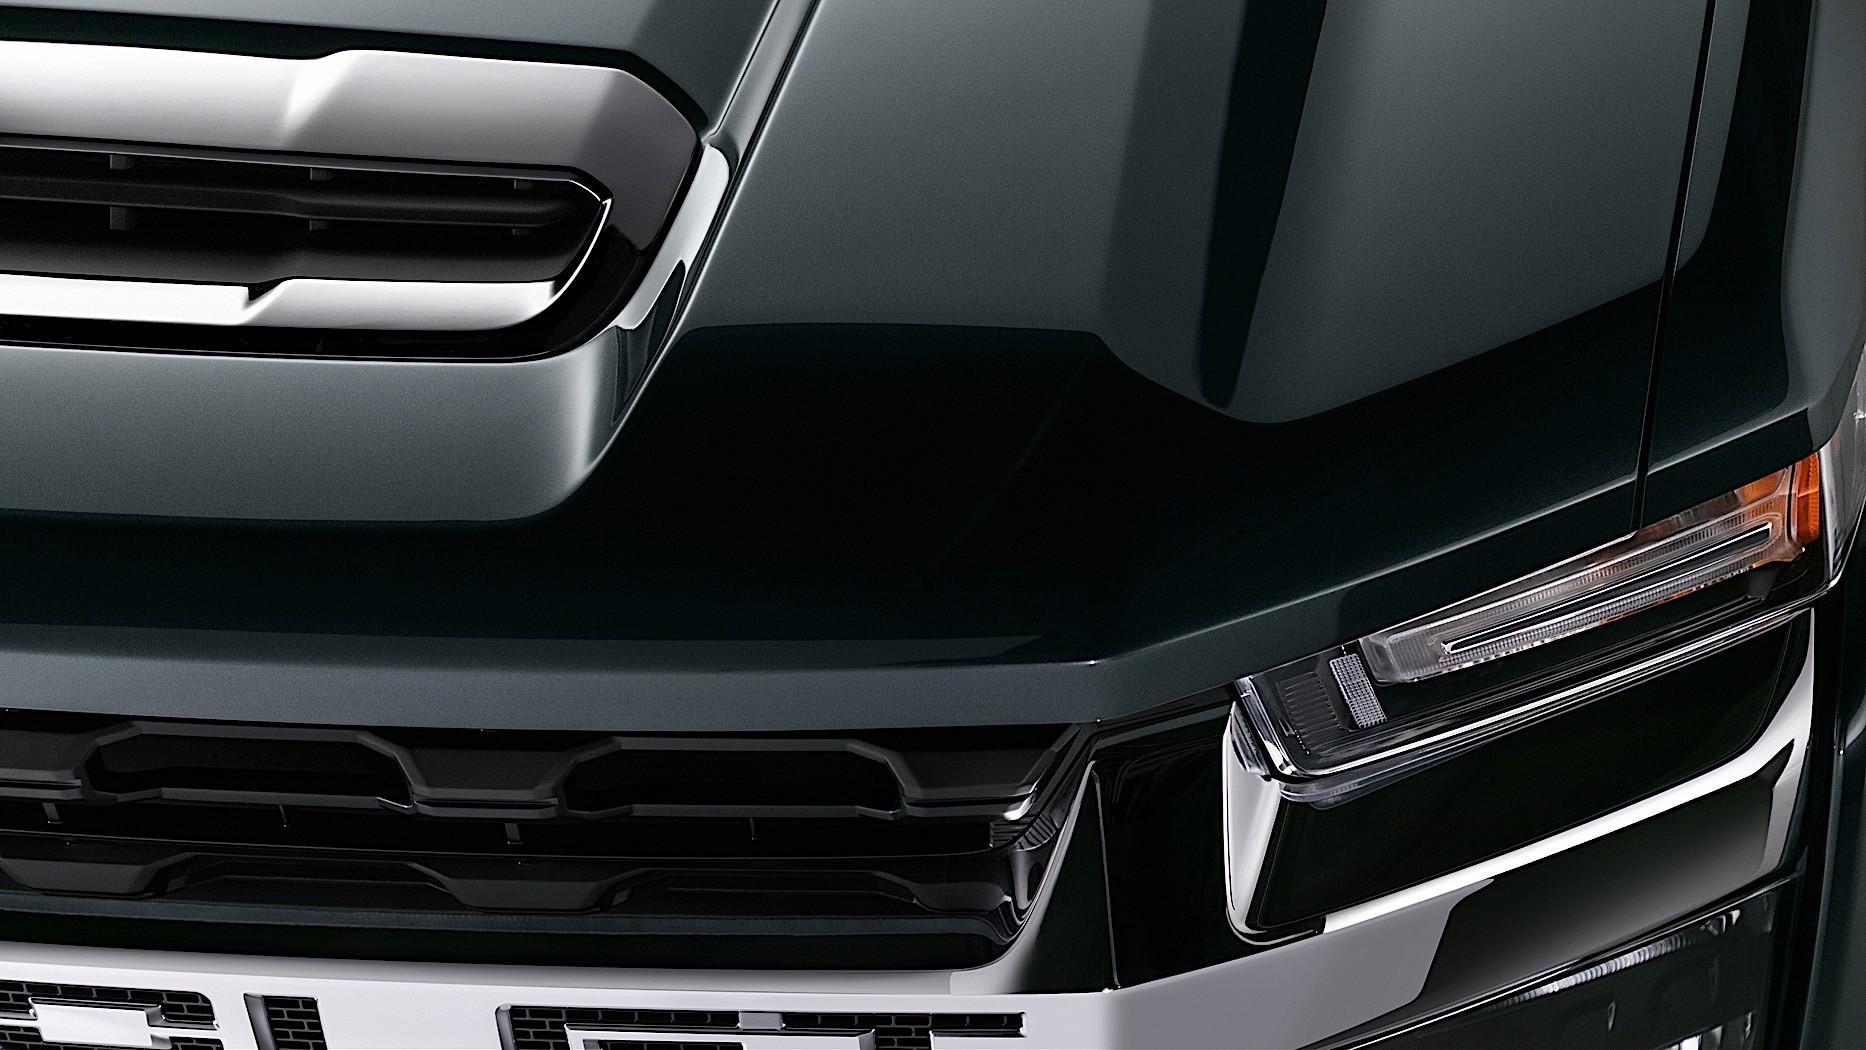 Limited Edition Silverado >> 2020 Chevrolet Silverado HD Looks Bling-Bling In High Country Flavor - autoevolution